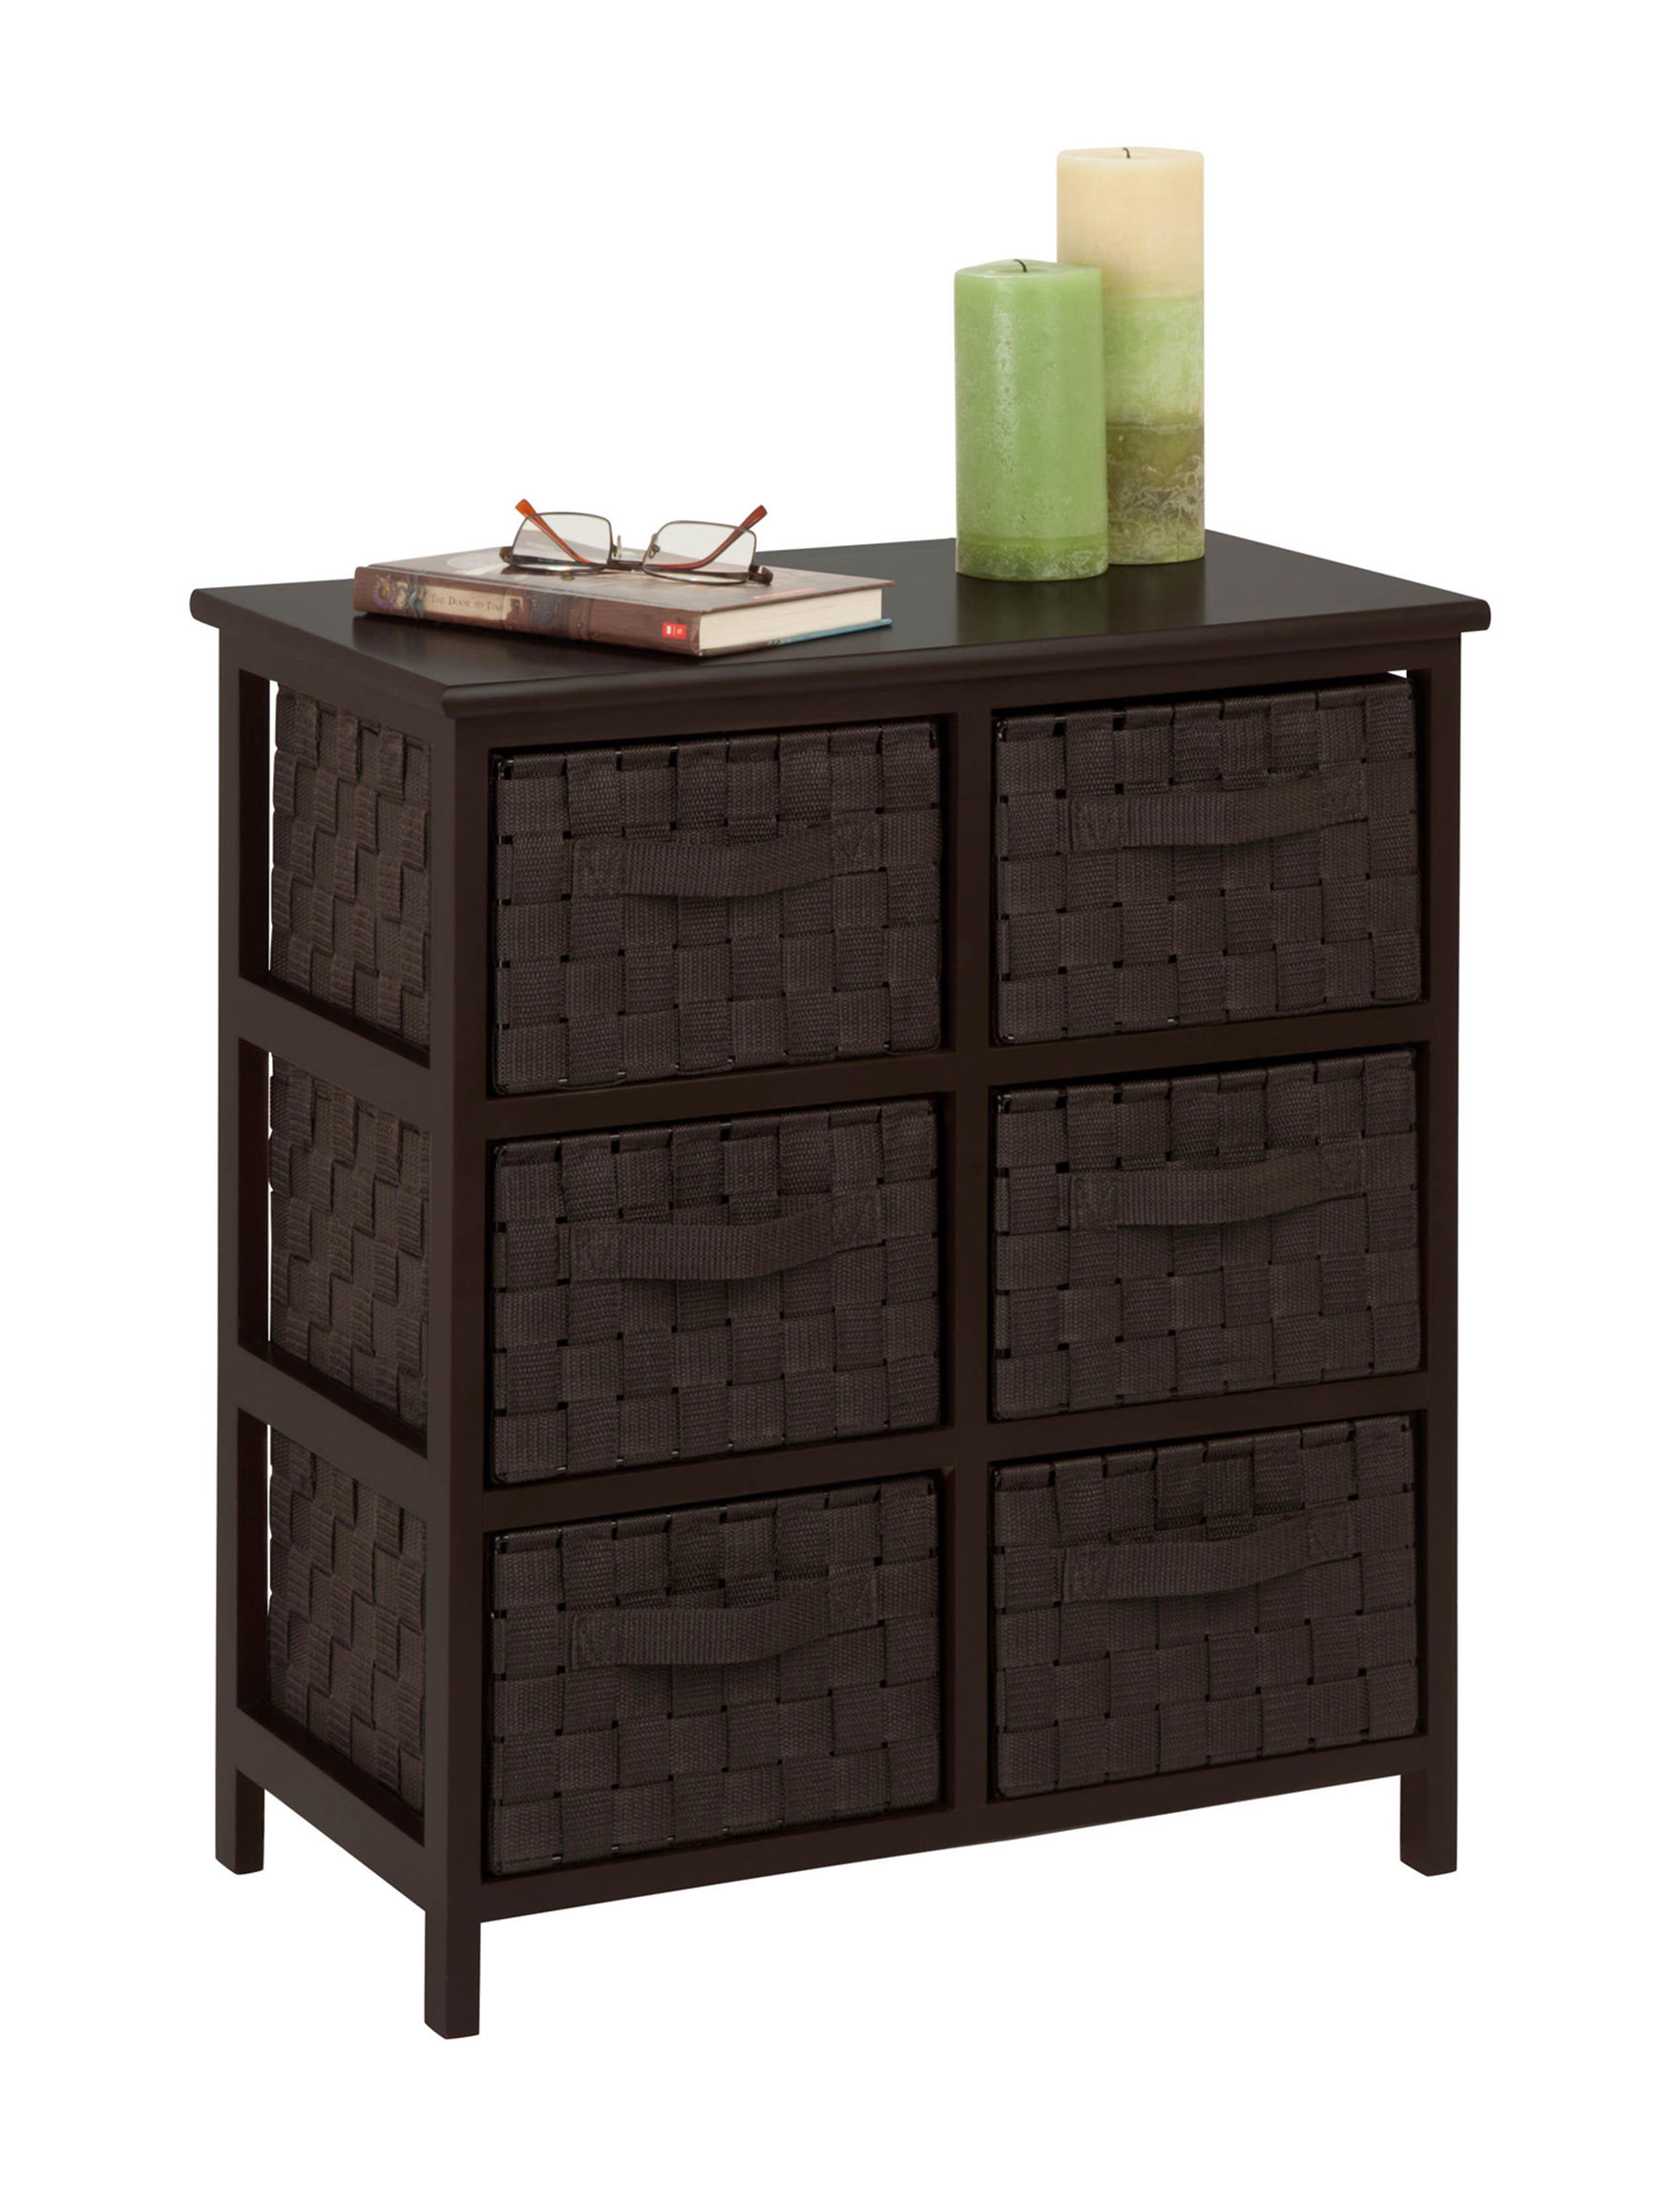 Honey-Can-Do International Dark Brown Carts & Drawers Storage & Organization